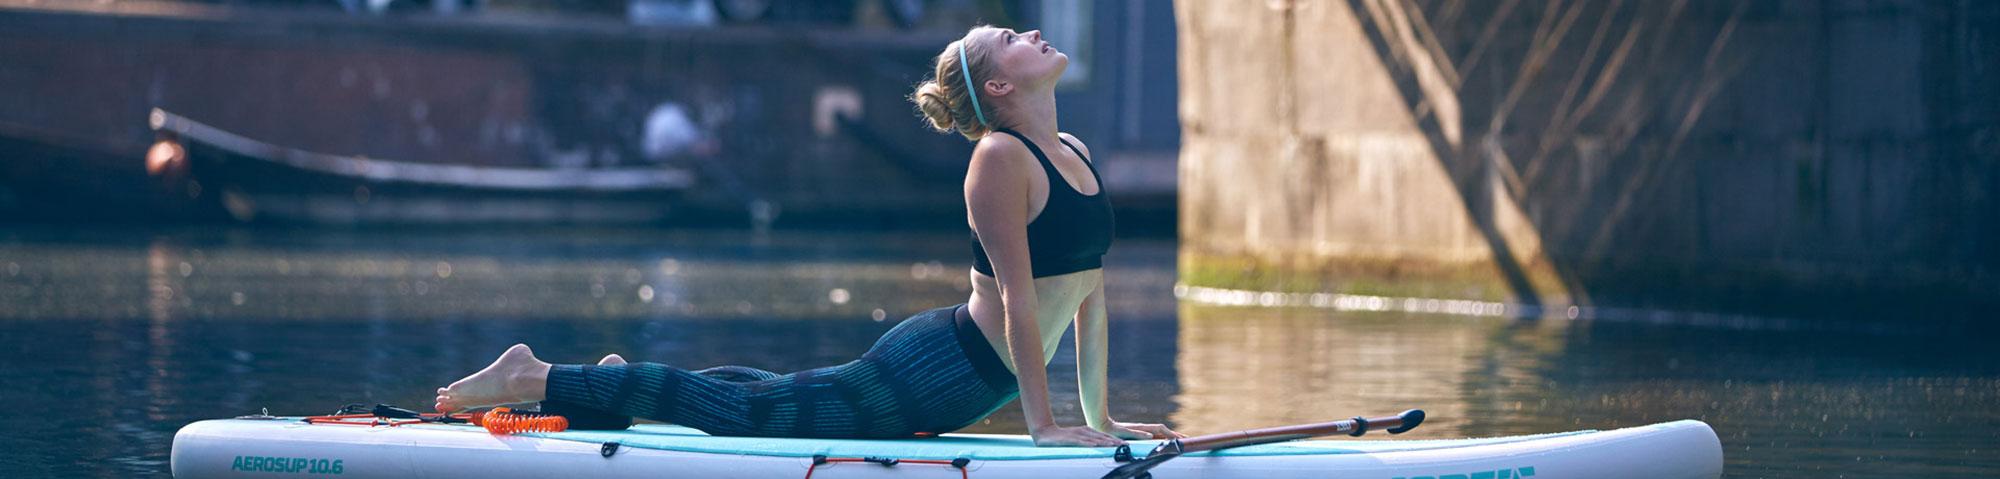 SUP yoga | Eemhof Watersport & Beachclub